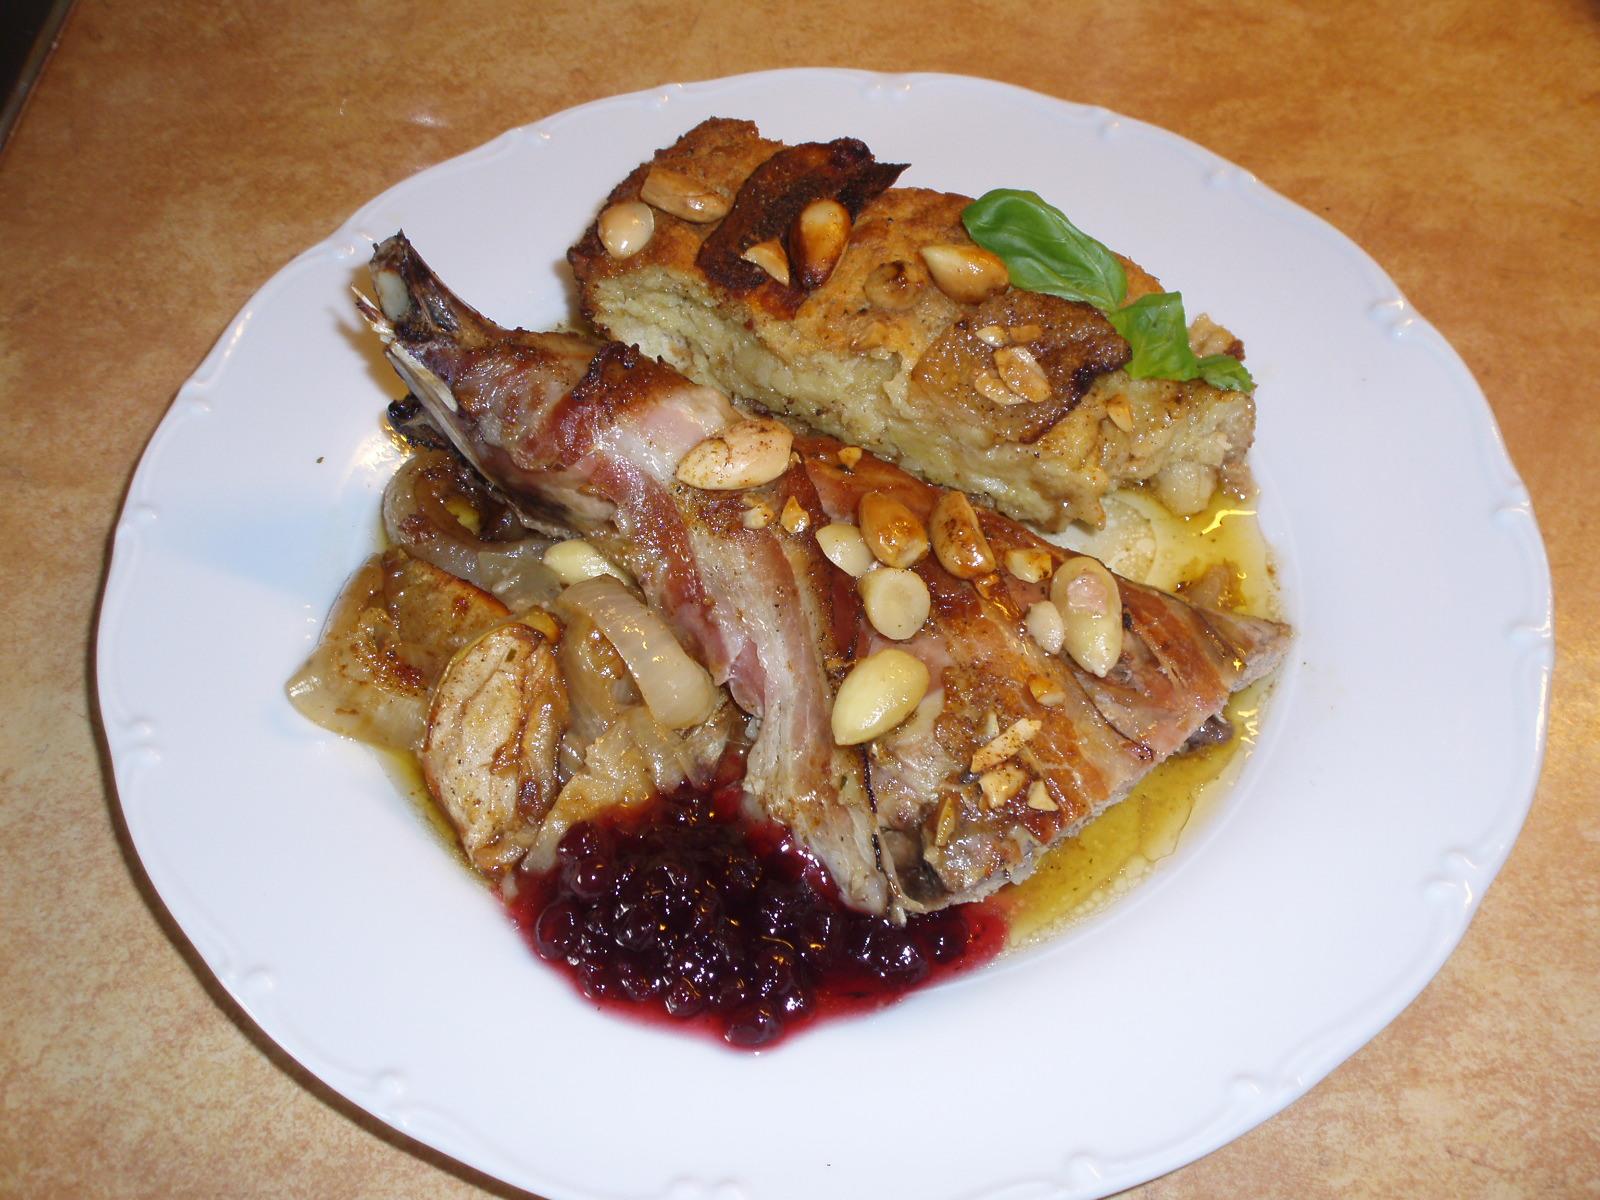 Fotografie receptu: Pečený bažant s mandlovou nádivkou